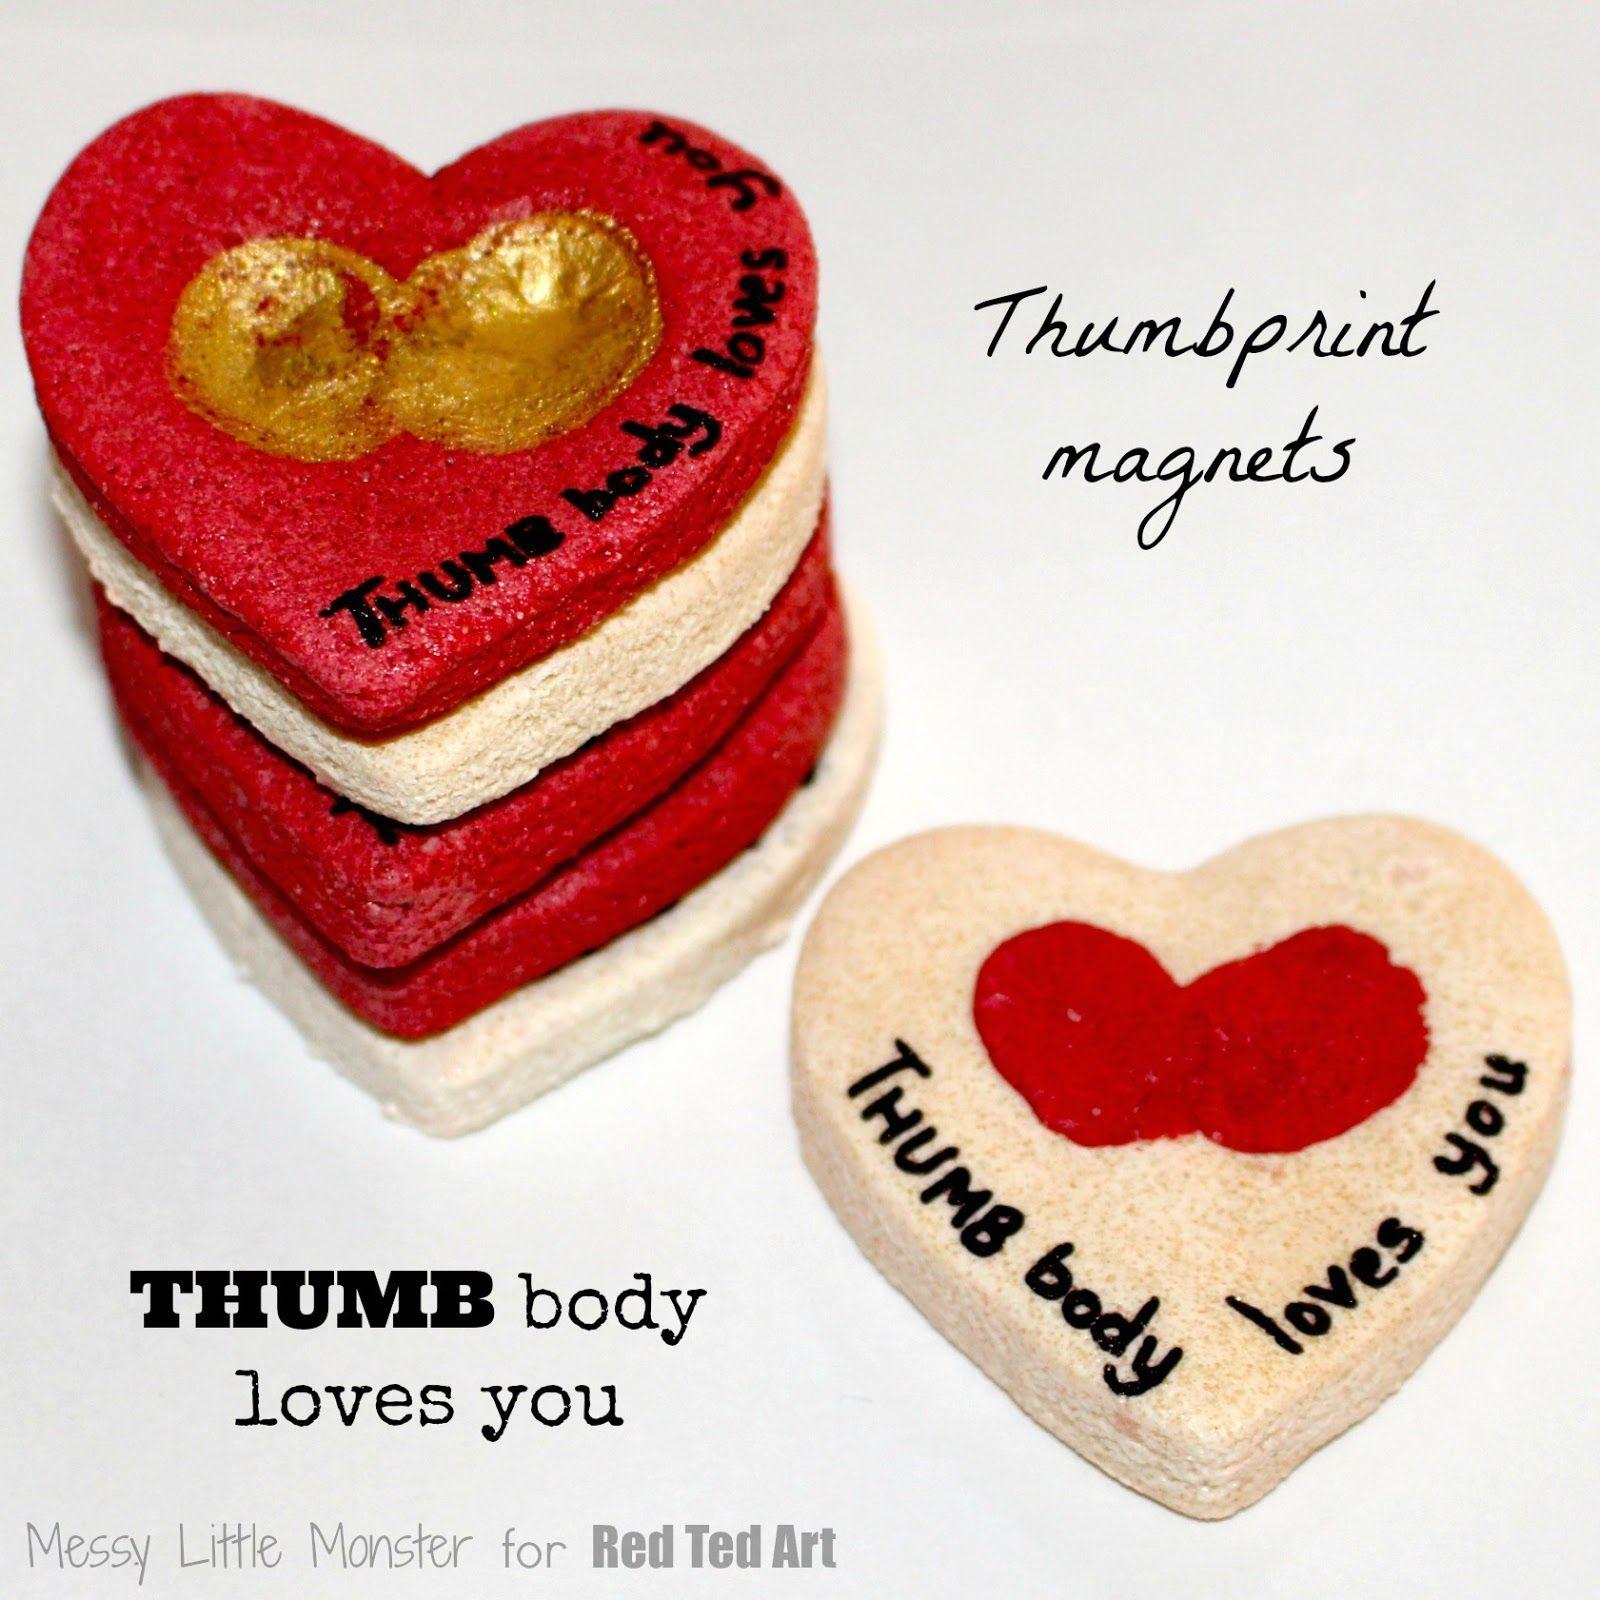 Thumbbody Loves You Thumbprint Magnet Valentine Crafts For Kids